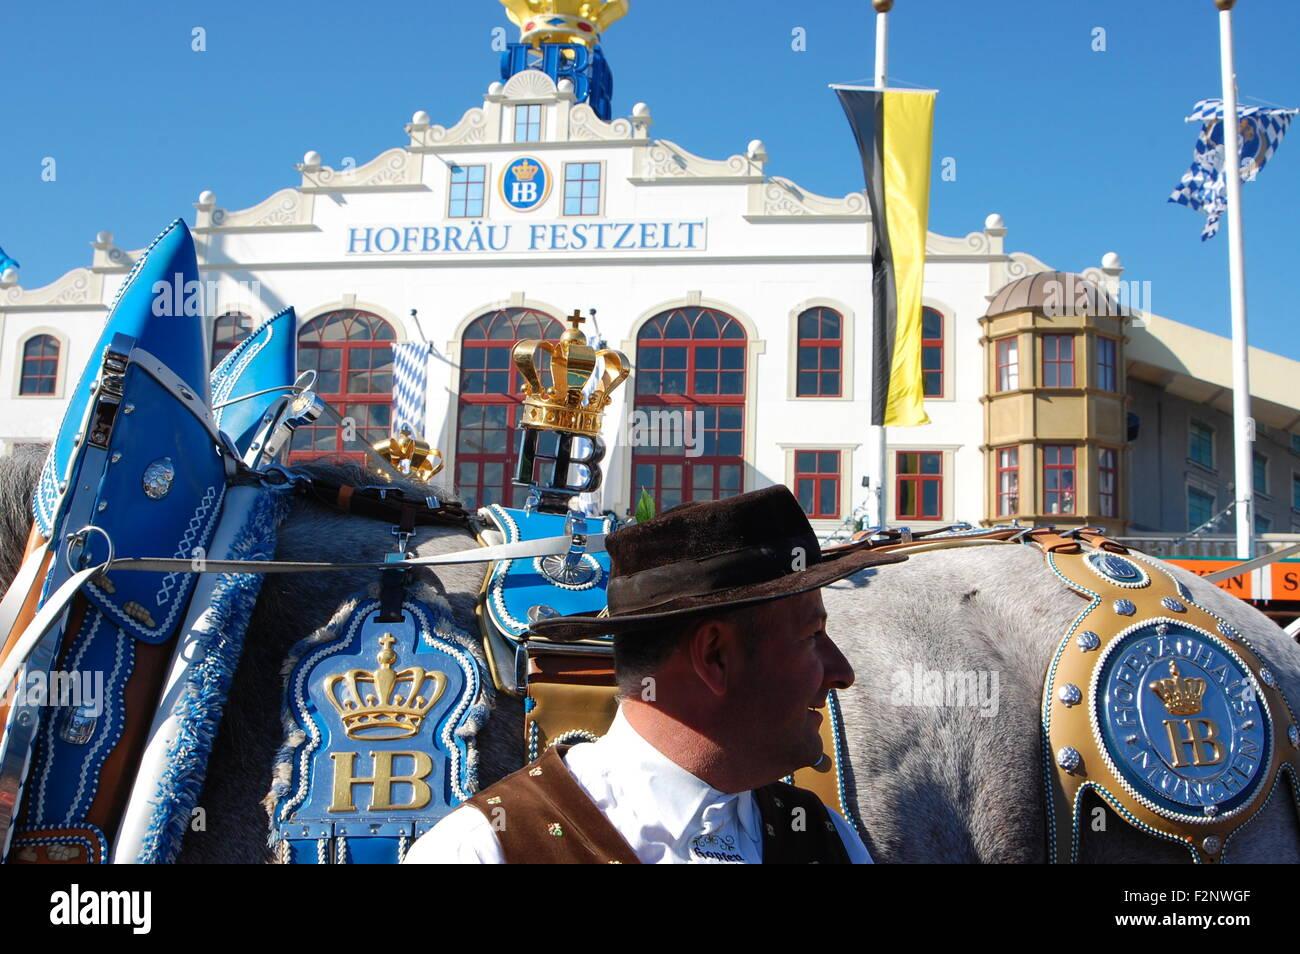 Hofbräu Festzelt and Hofbräu horse pulling beer kegs at the Oktoberfest, Munich, Germany - Stock Image